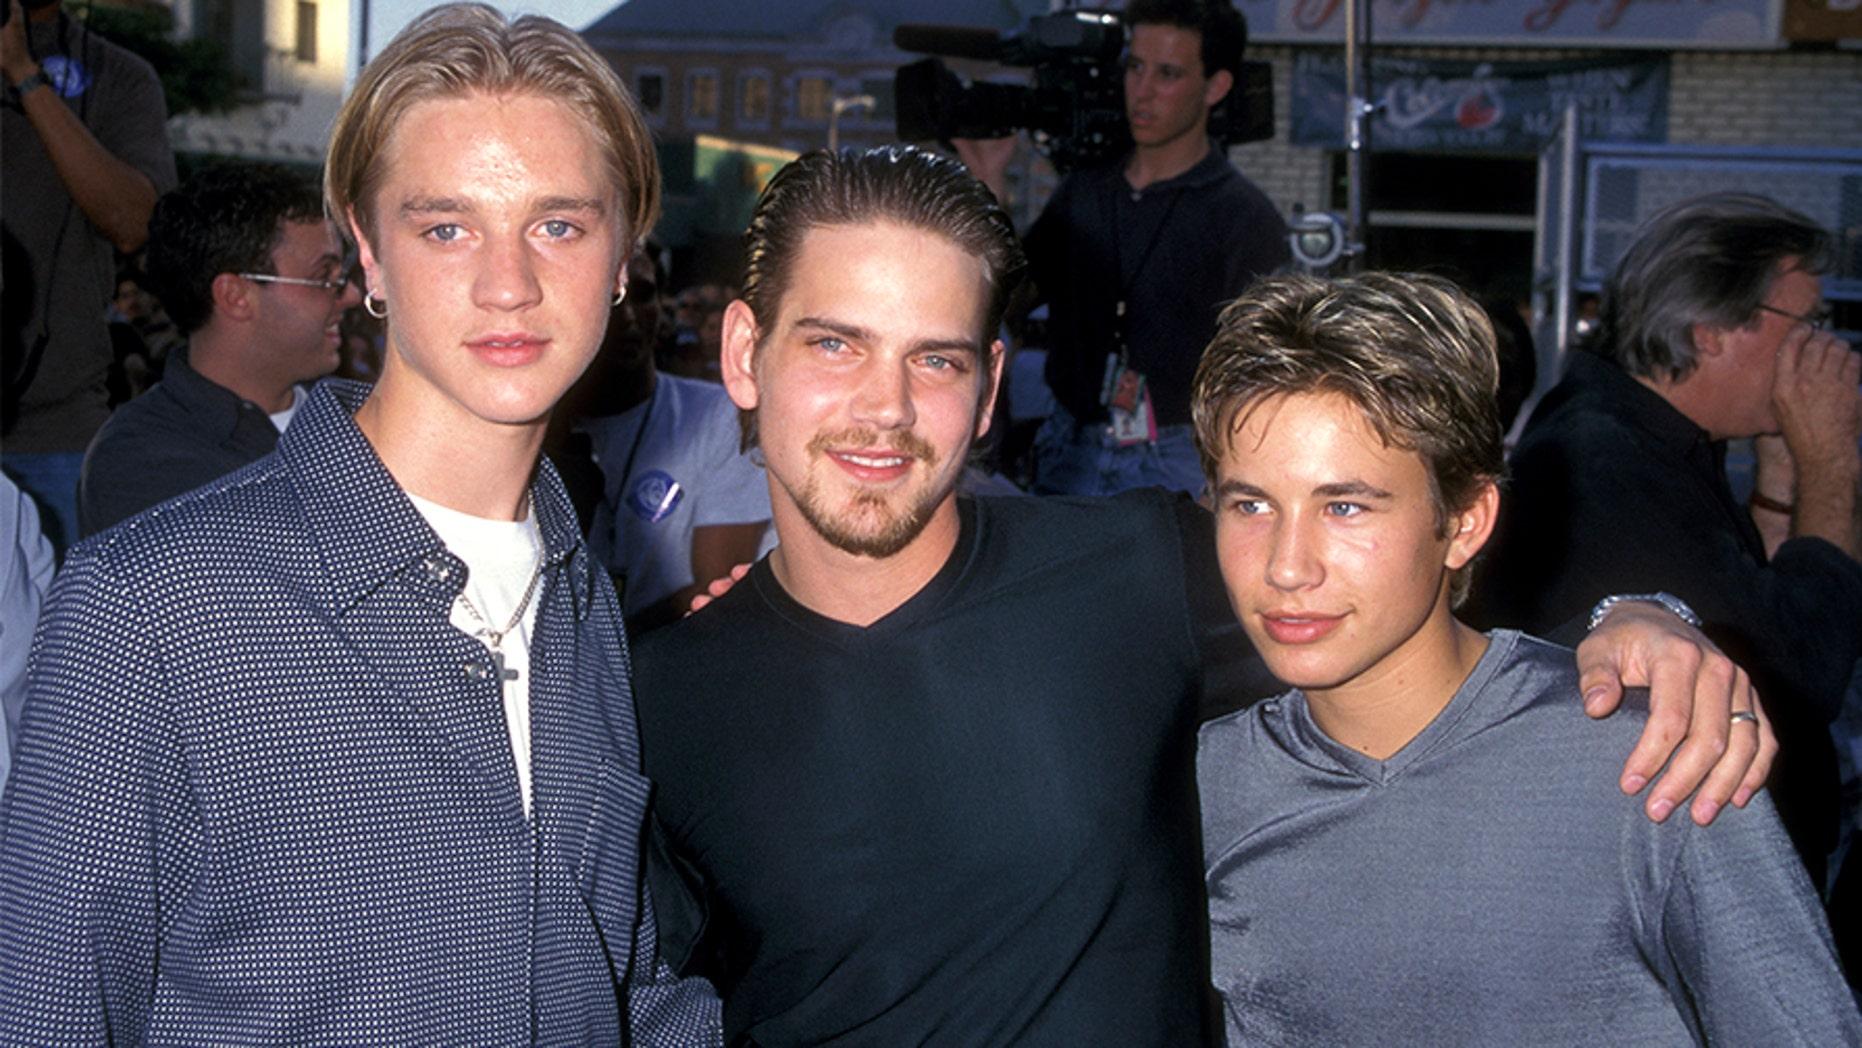 Devon Sawa (L), Scott Bairstow and Jonathan Taylor Thomas.